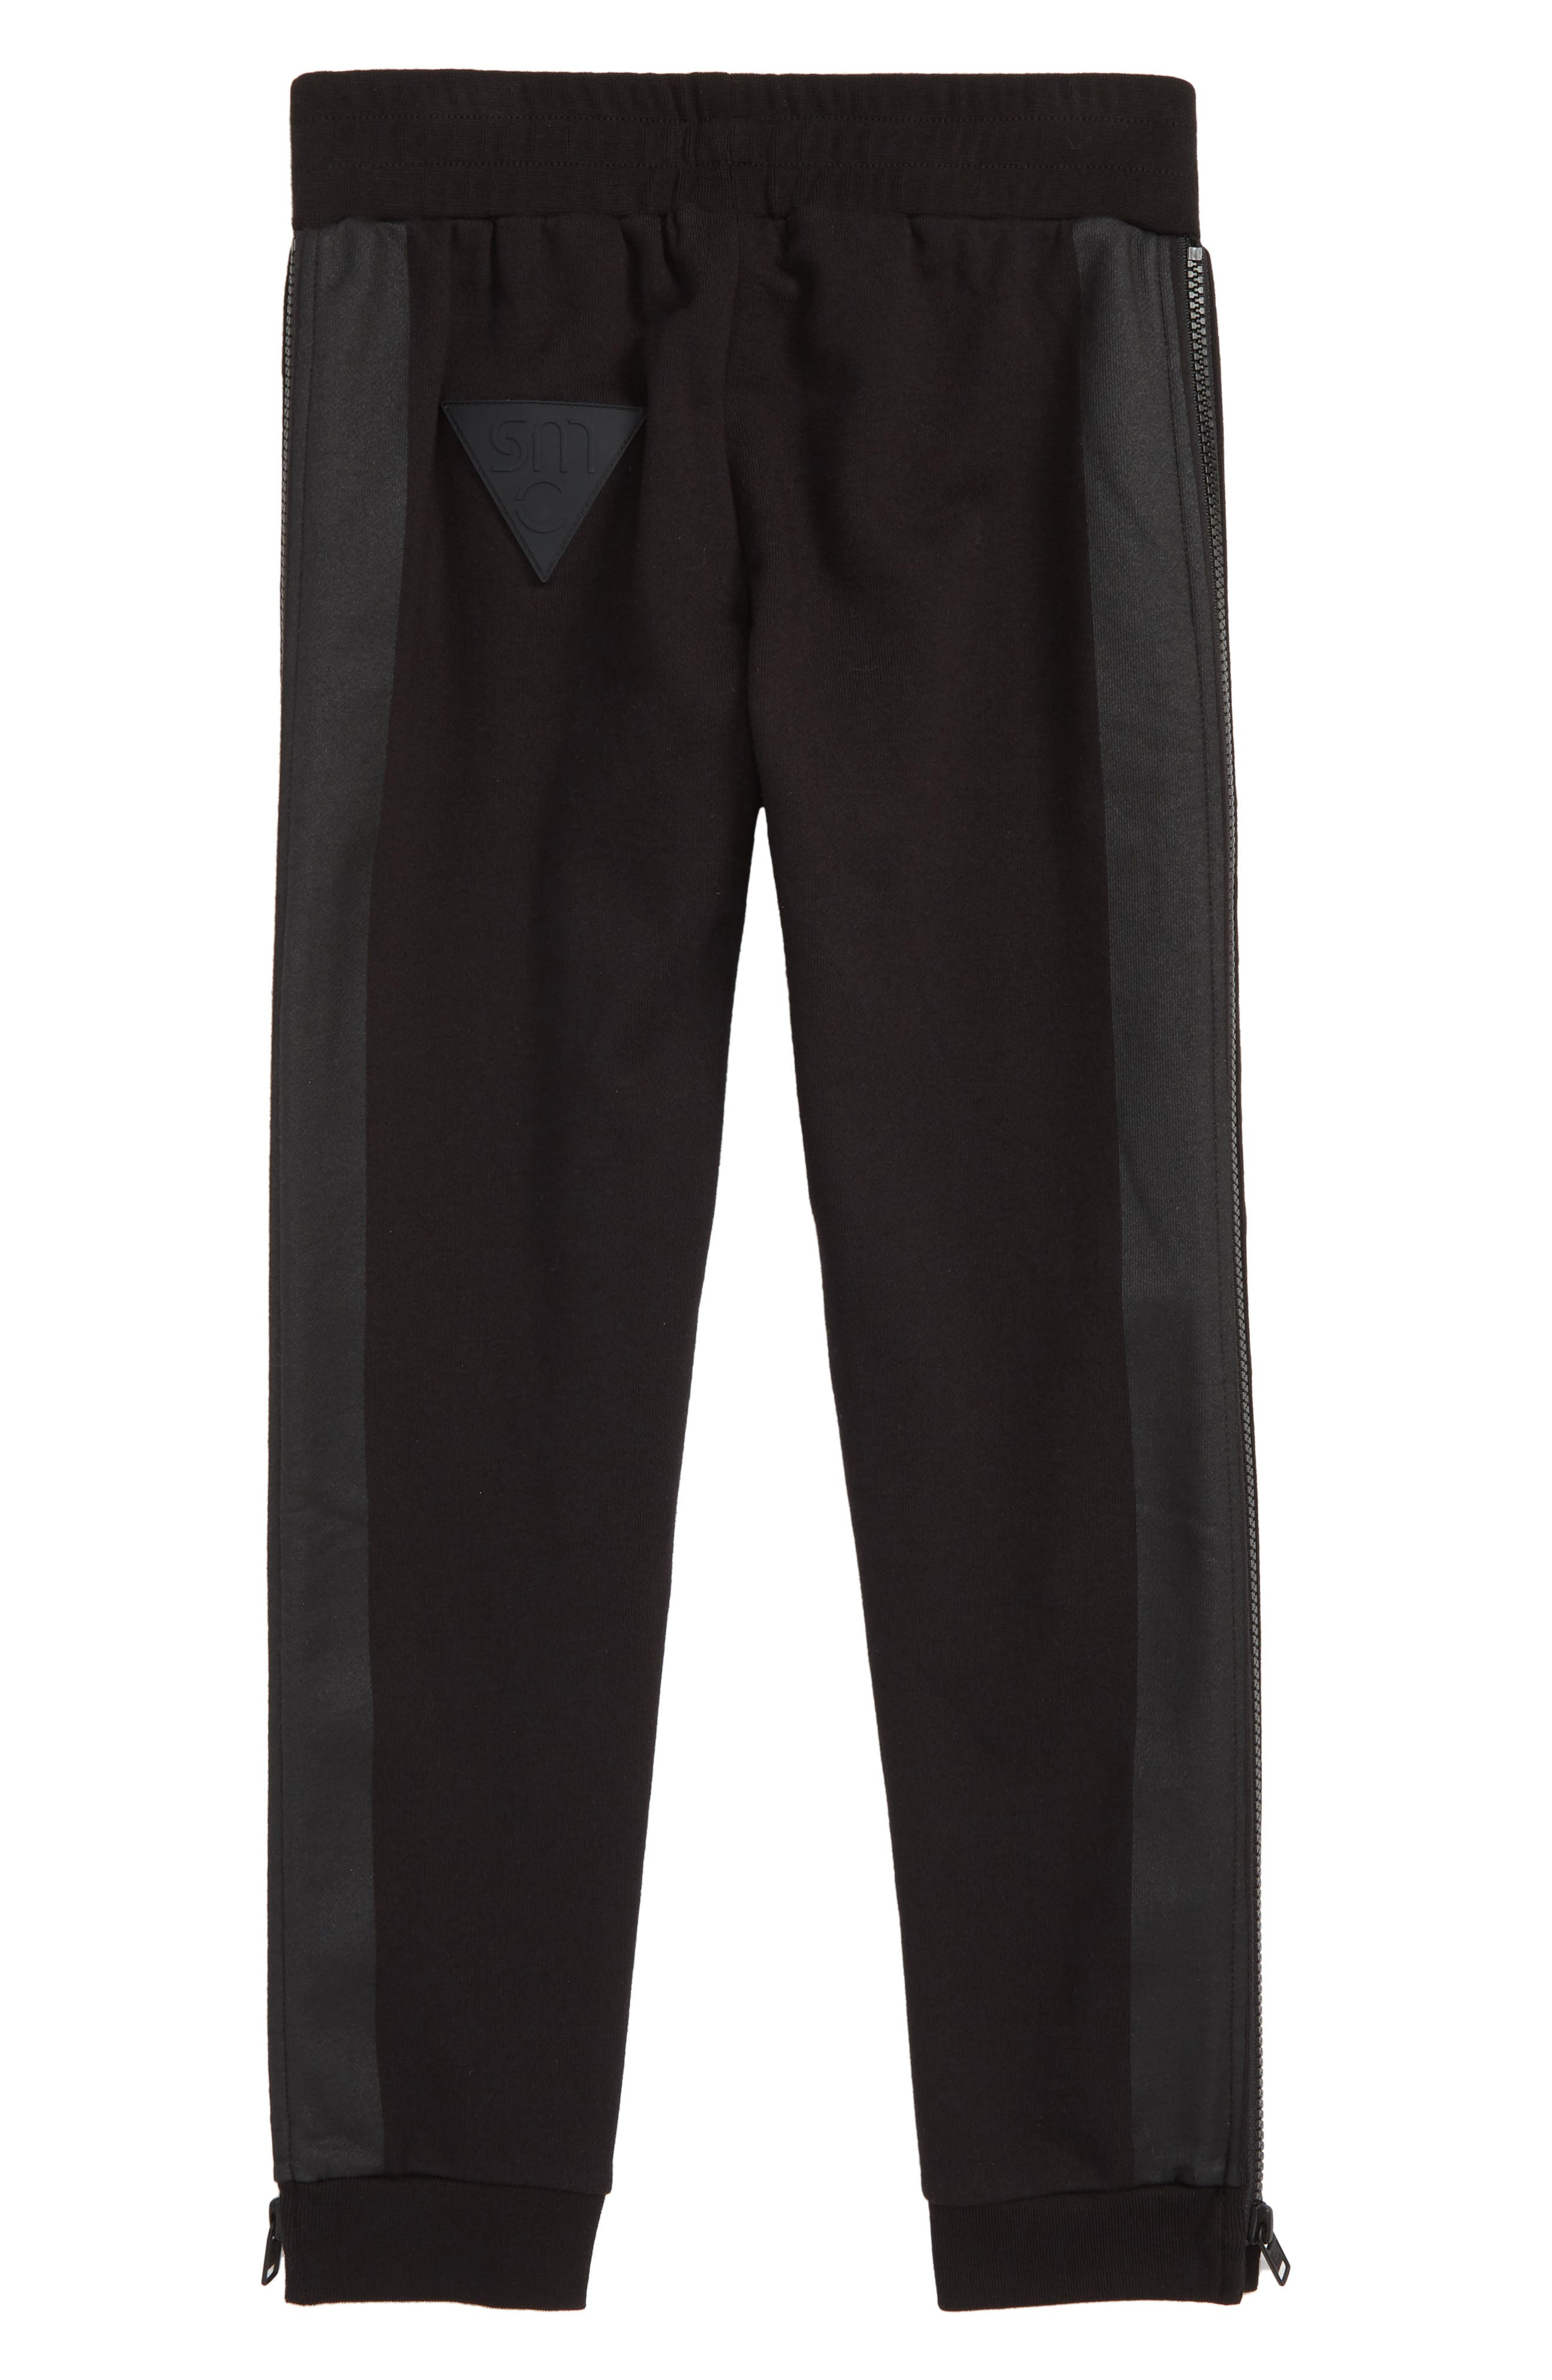 Stella McCartney Logo Sweatpants,                             Alternate thumbnail 2, color,                             BLACK